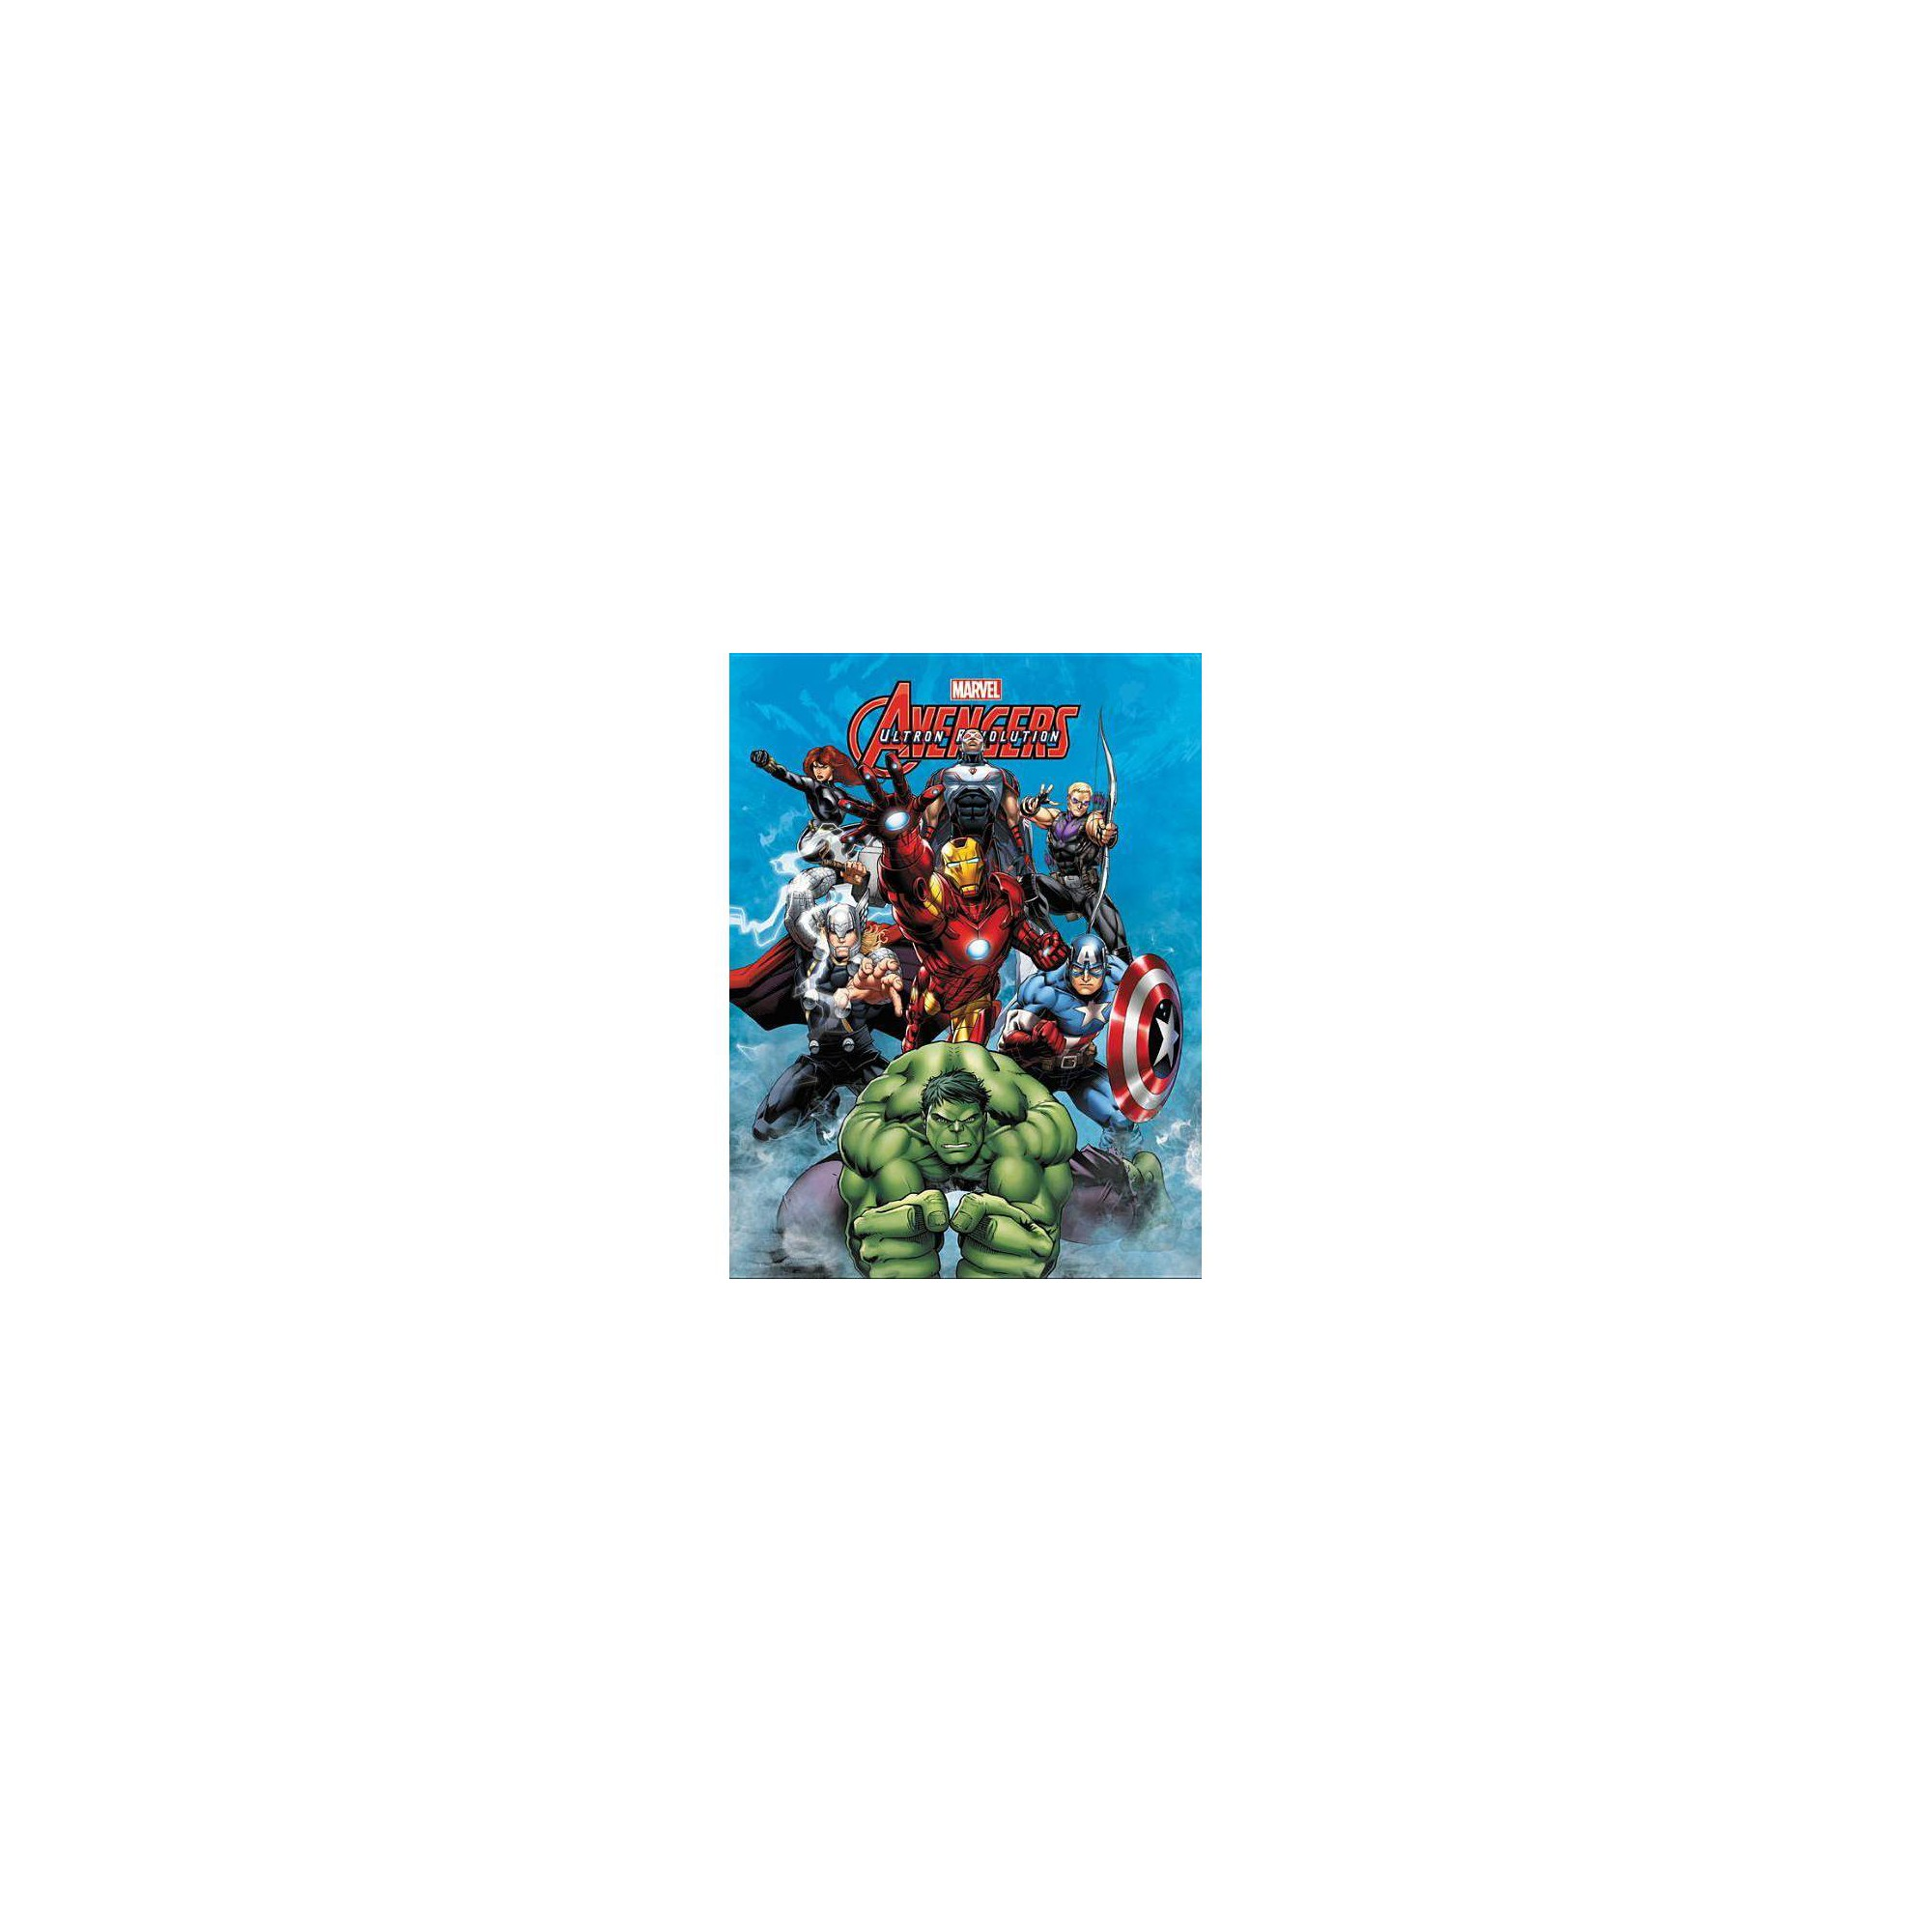 Marvel Universe Avengers: Ultron Revolution Vol. 3 - (Paperback)